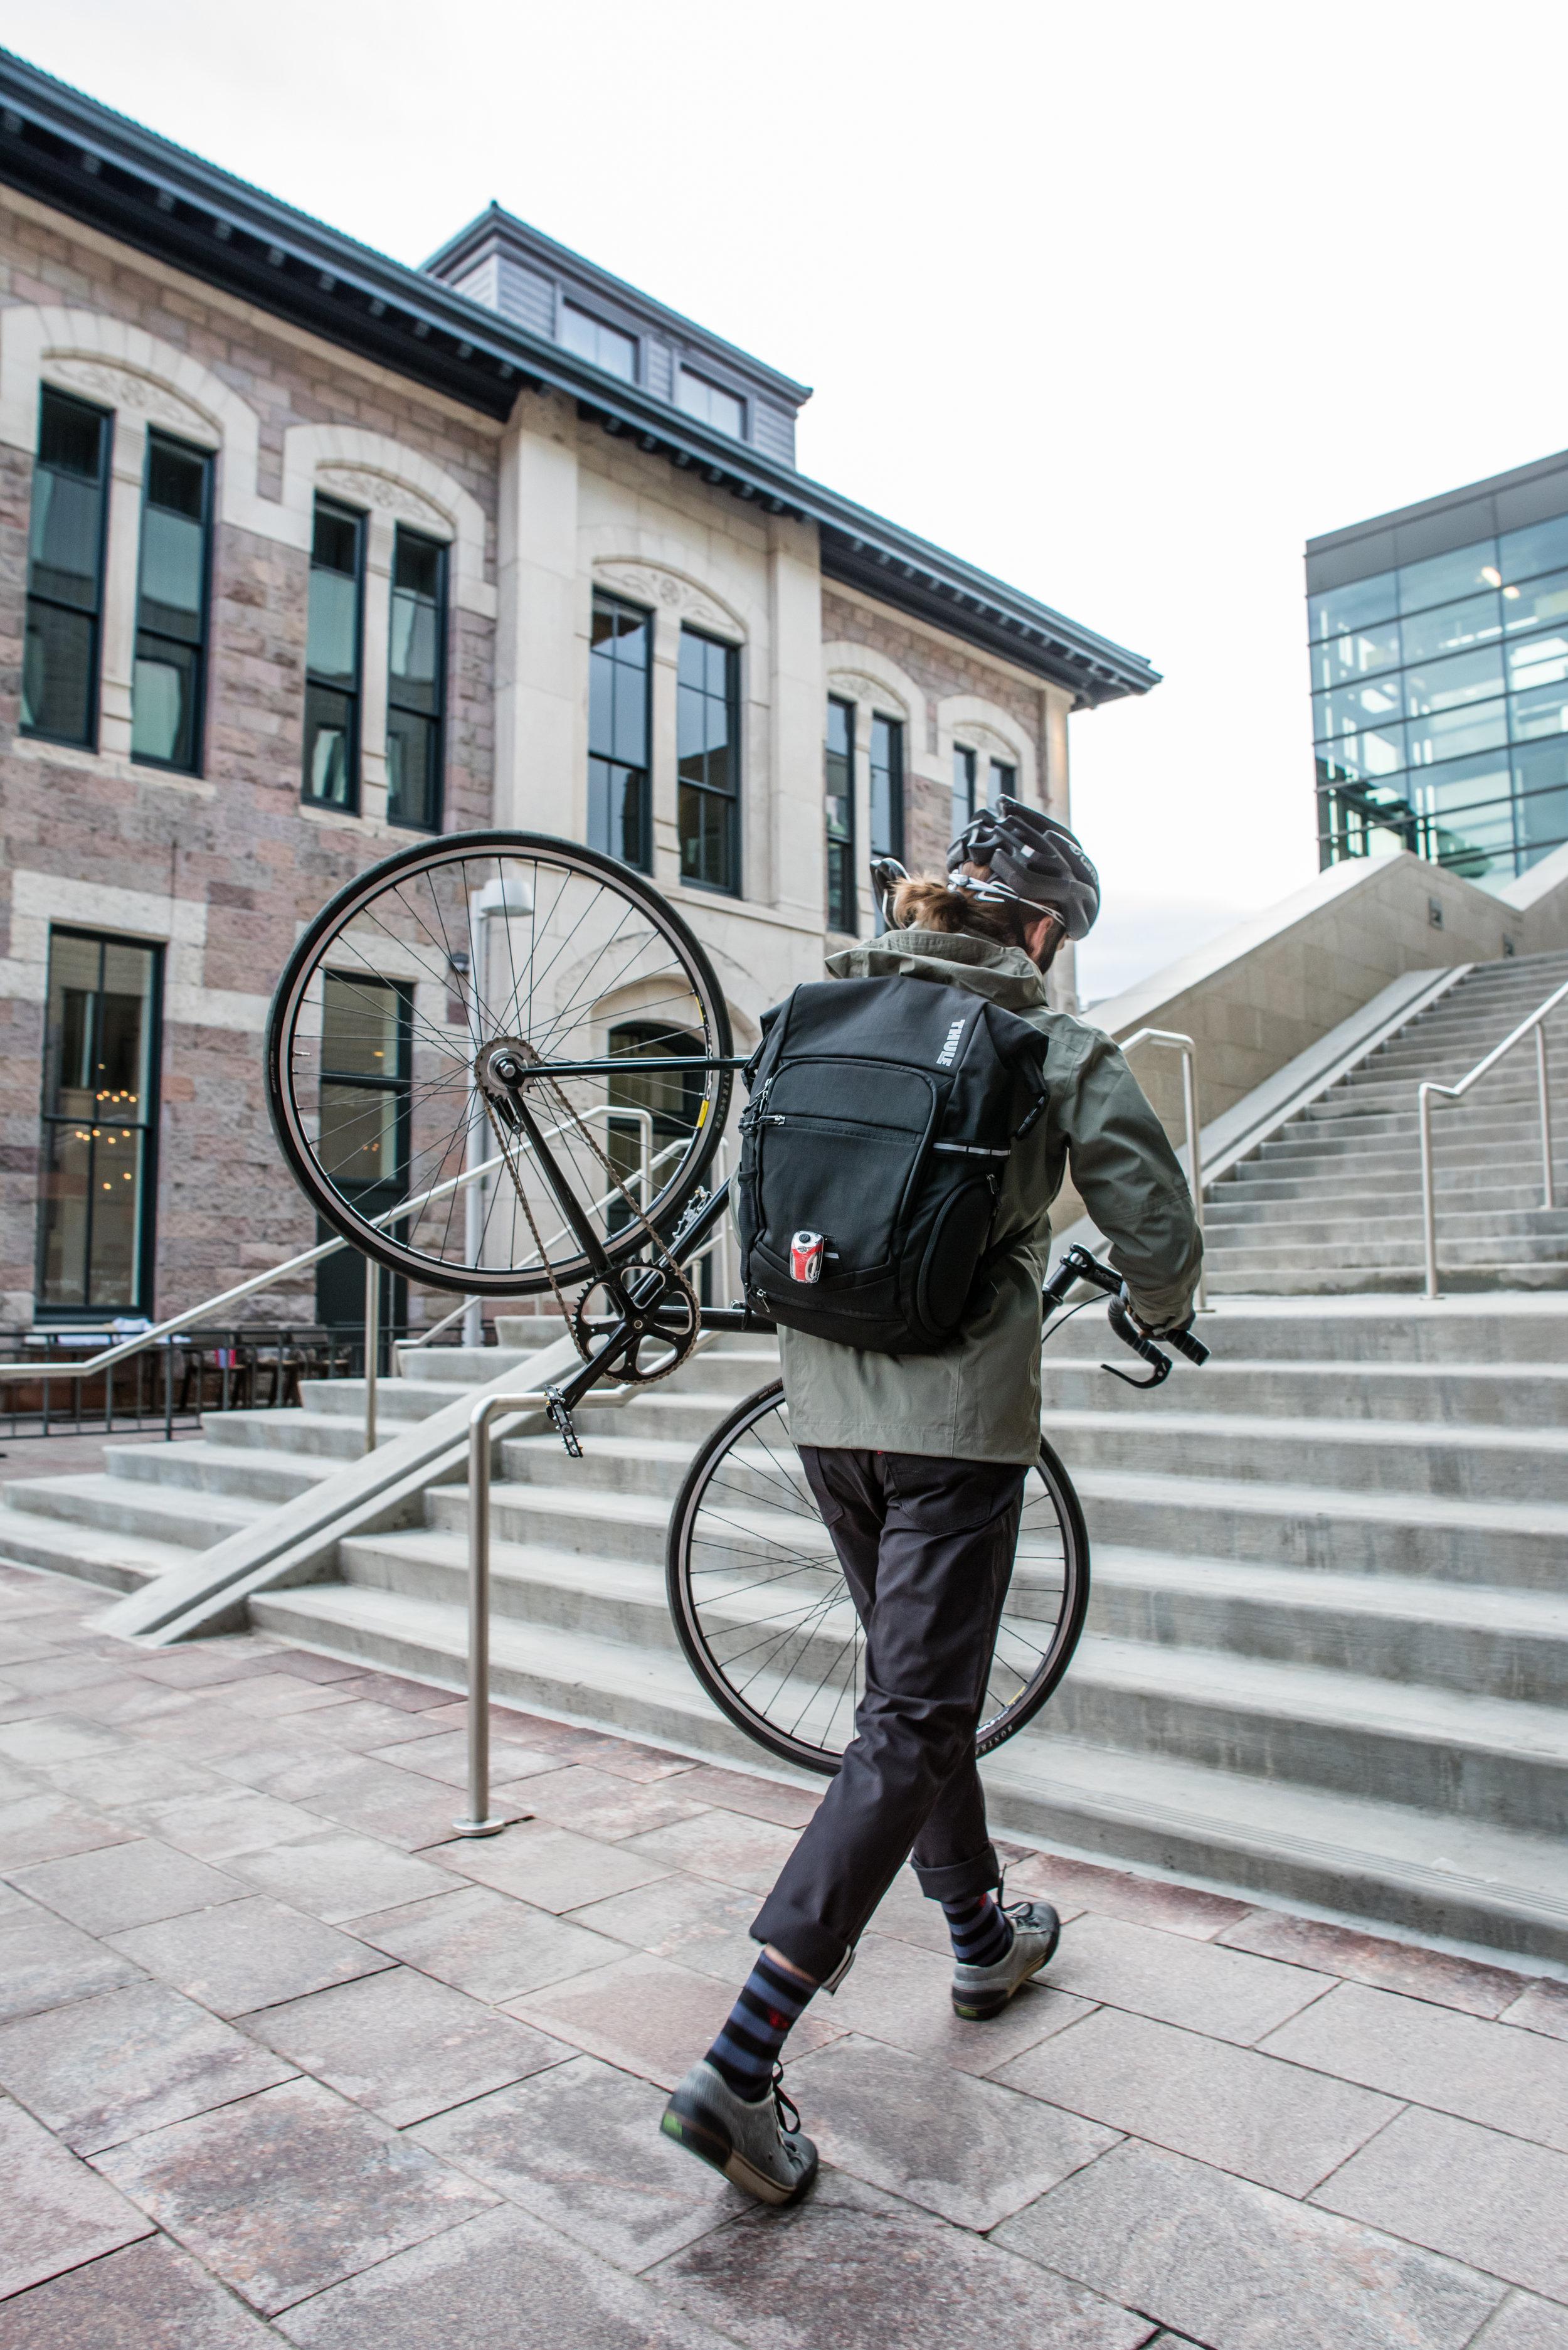 Thule Bike To Work-0314.jpg